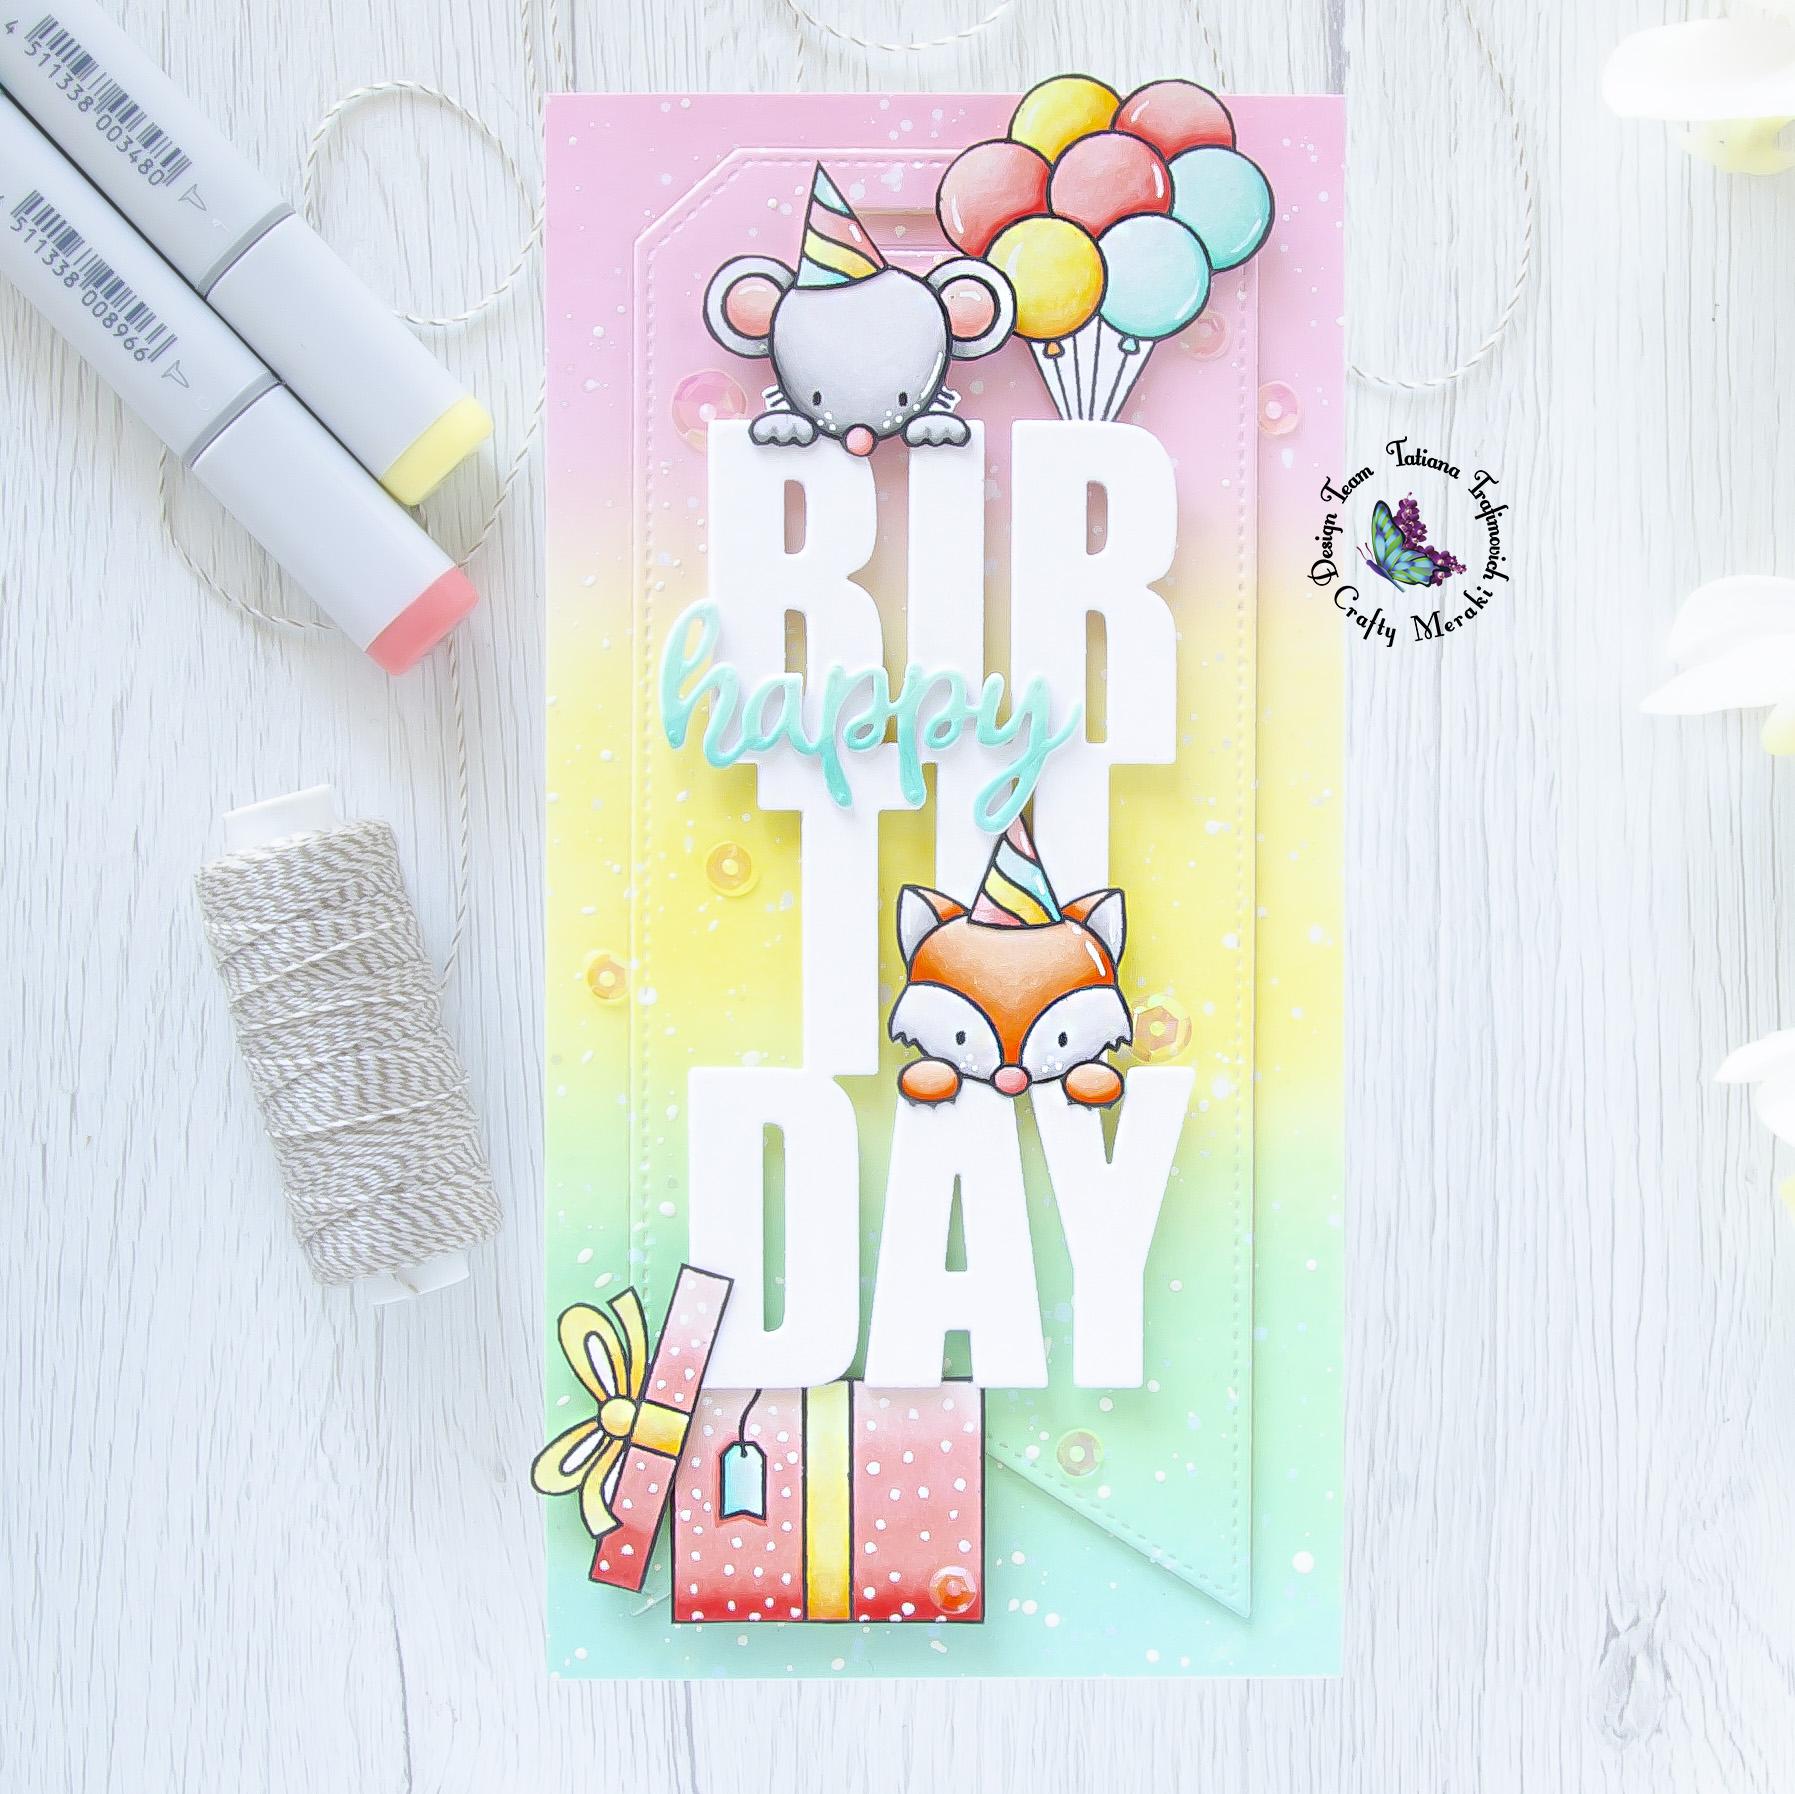 Happy Birthday #handmade card by Tatiana Trafimovich #tatianacraftandart - Birthday Slimline Tag Die by Crafty Meraki #craftymeraki and Popping By Stamp Set by Heffy Doodle #heffydoodle